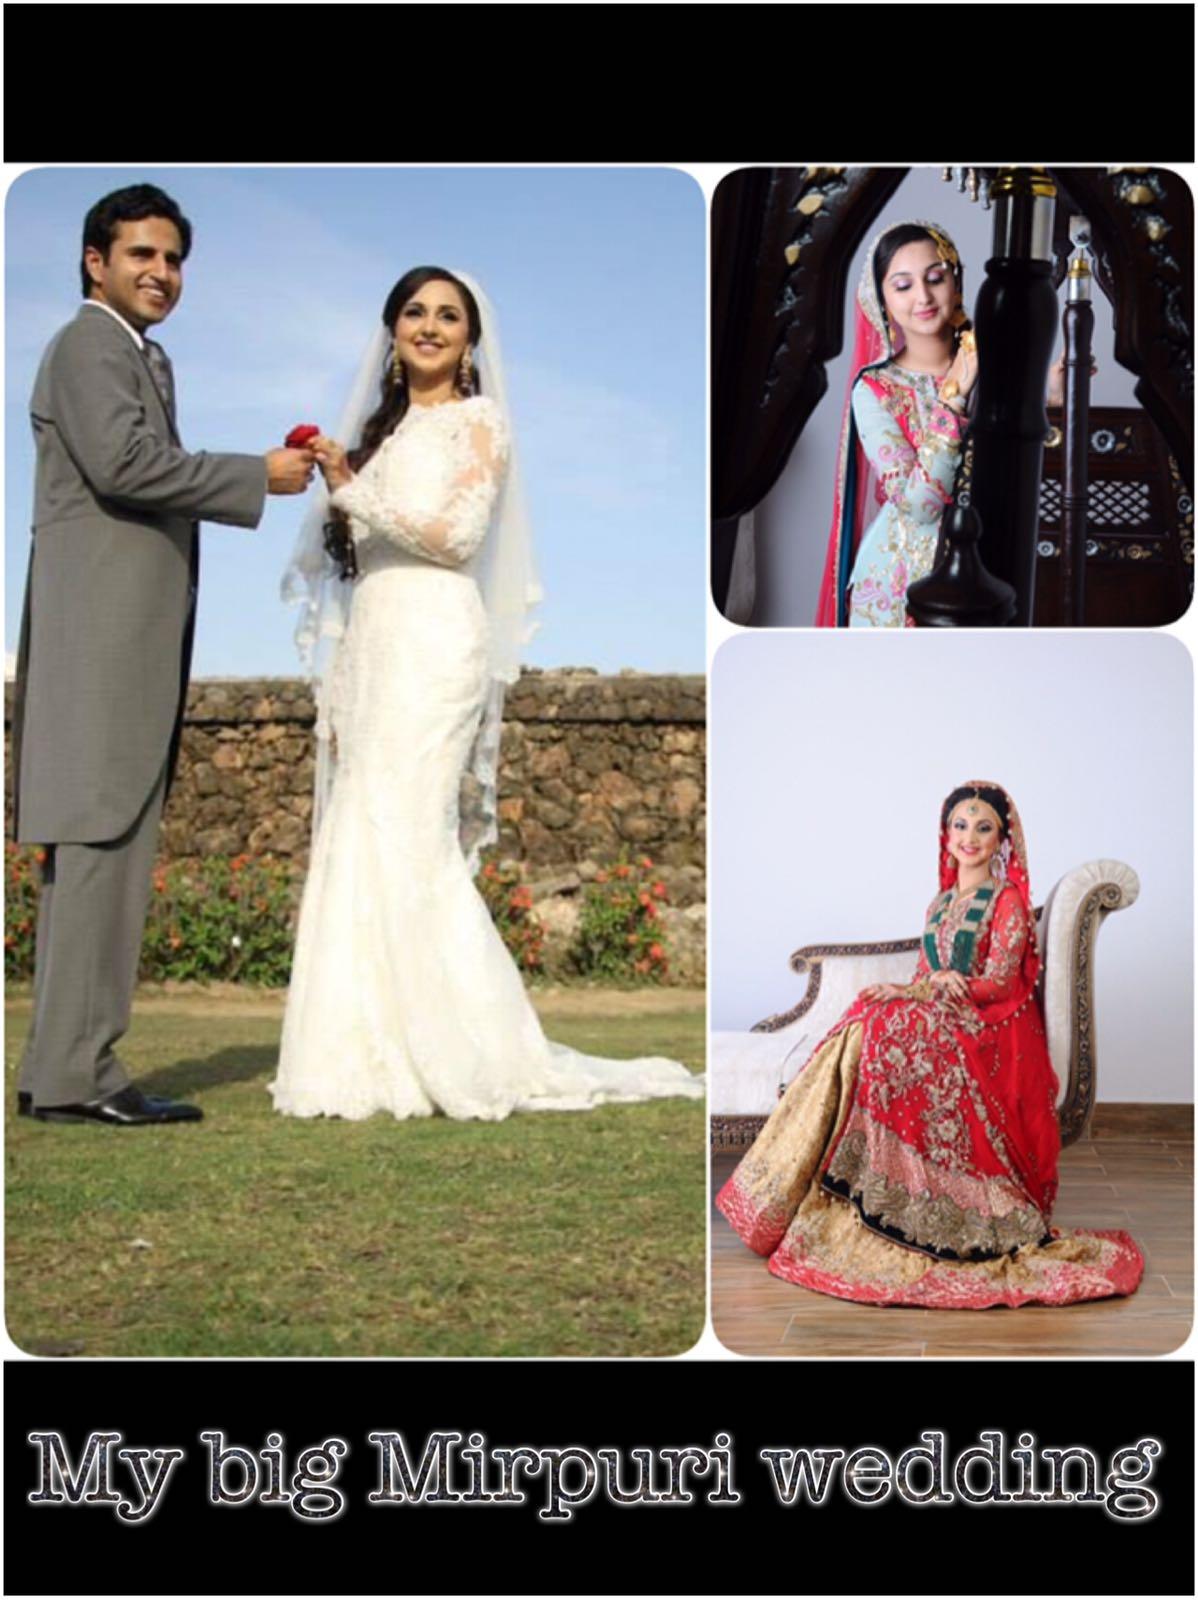 mirpur wedding